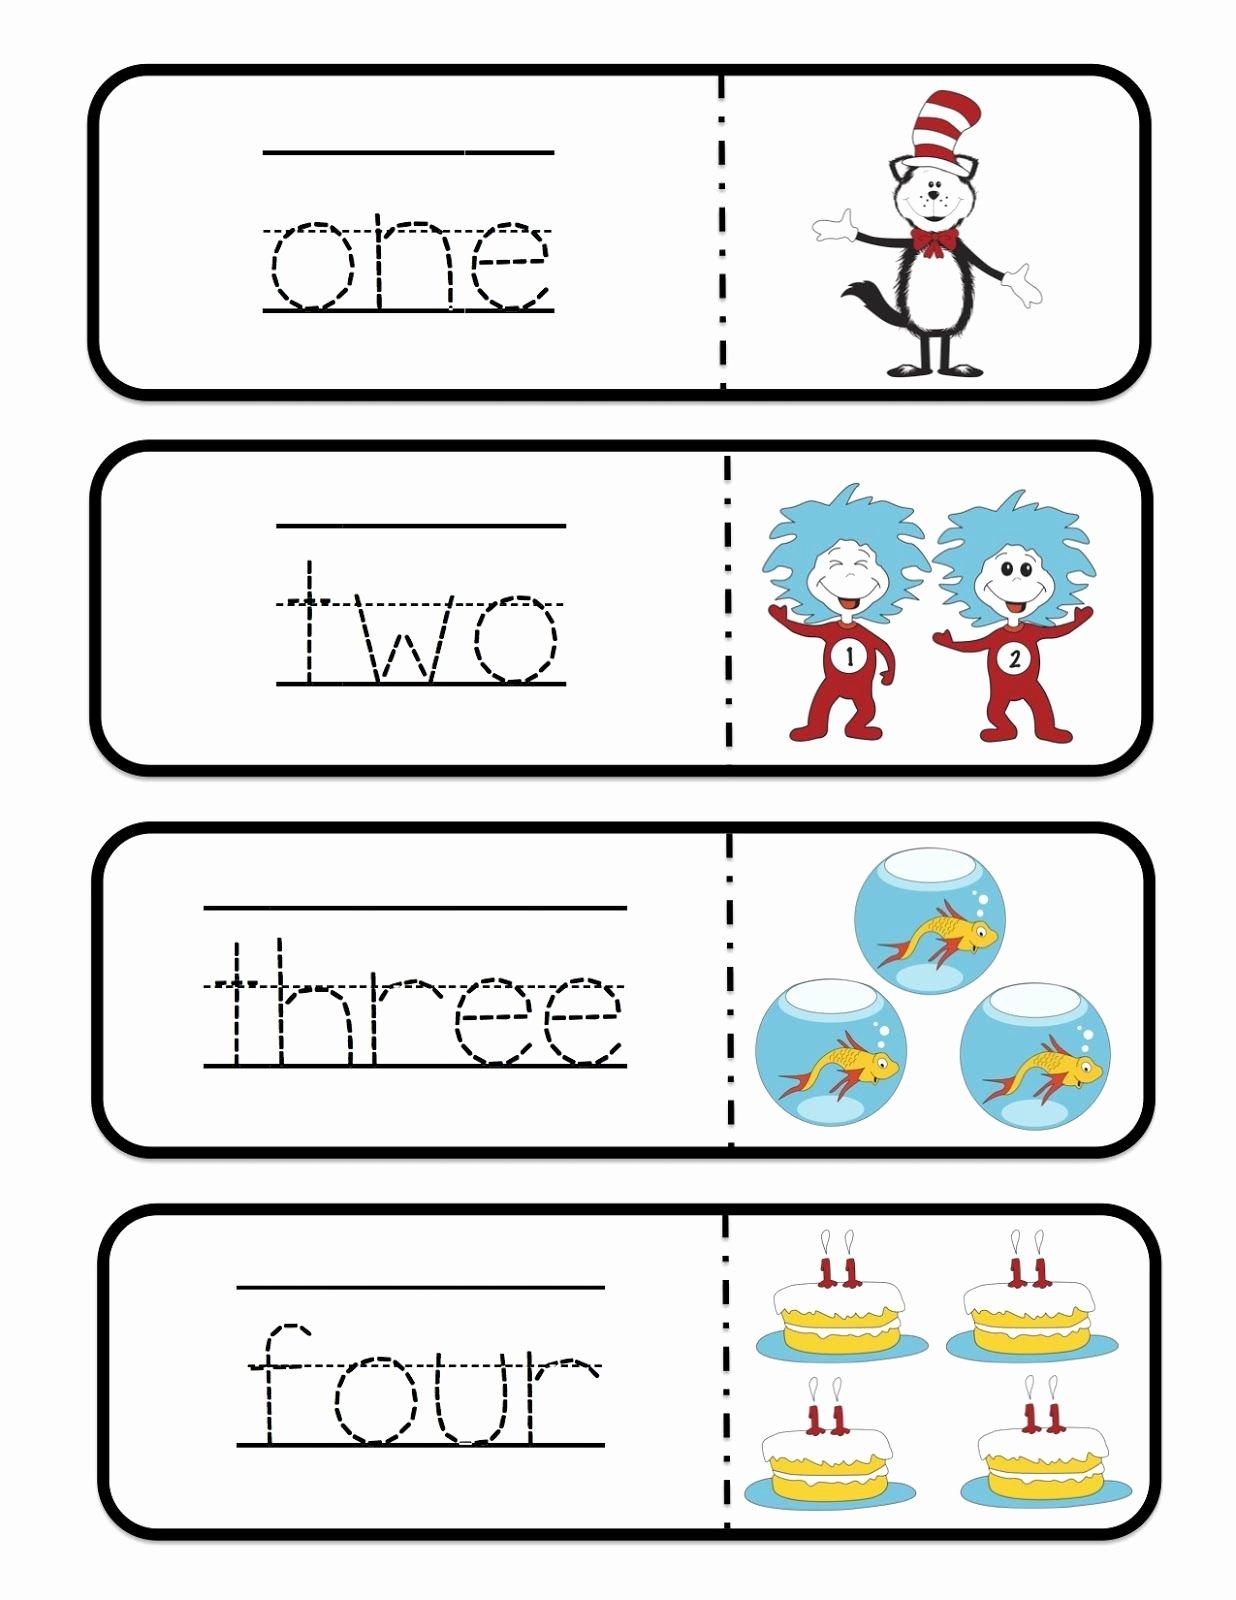 Dr Seuss Worksheets for Preschoolers Inspirational Tracing Drseuss